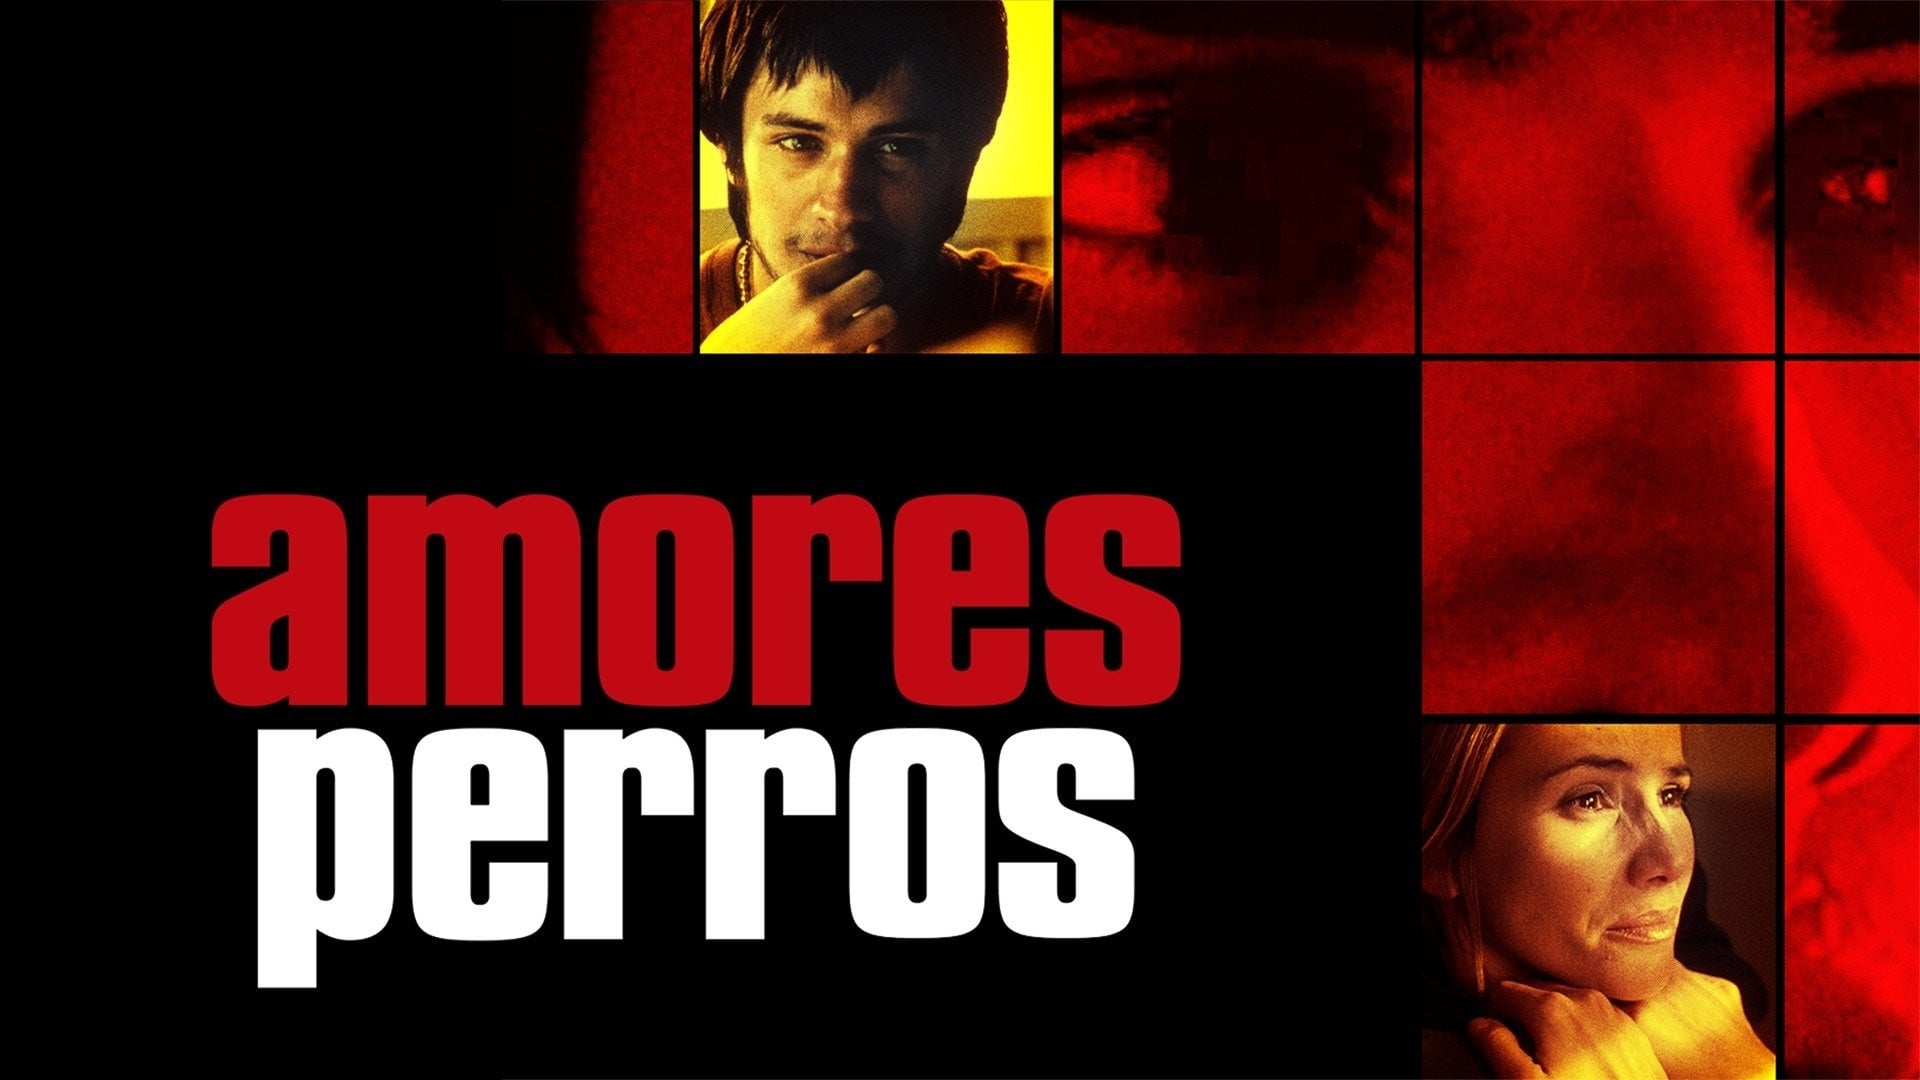 Ver Amores Perros 2000 Online Gratis Hd Castellano Espanol Latino Vose Pelisyseries Net